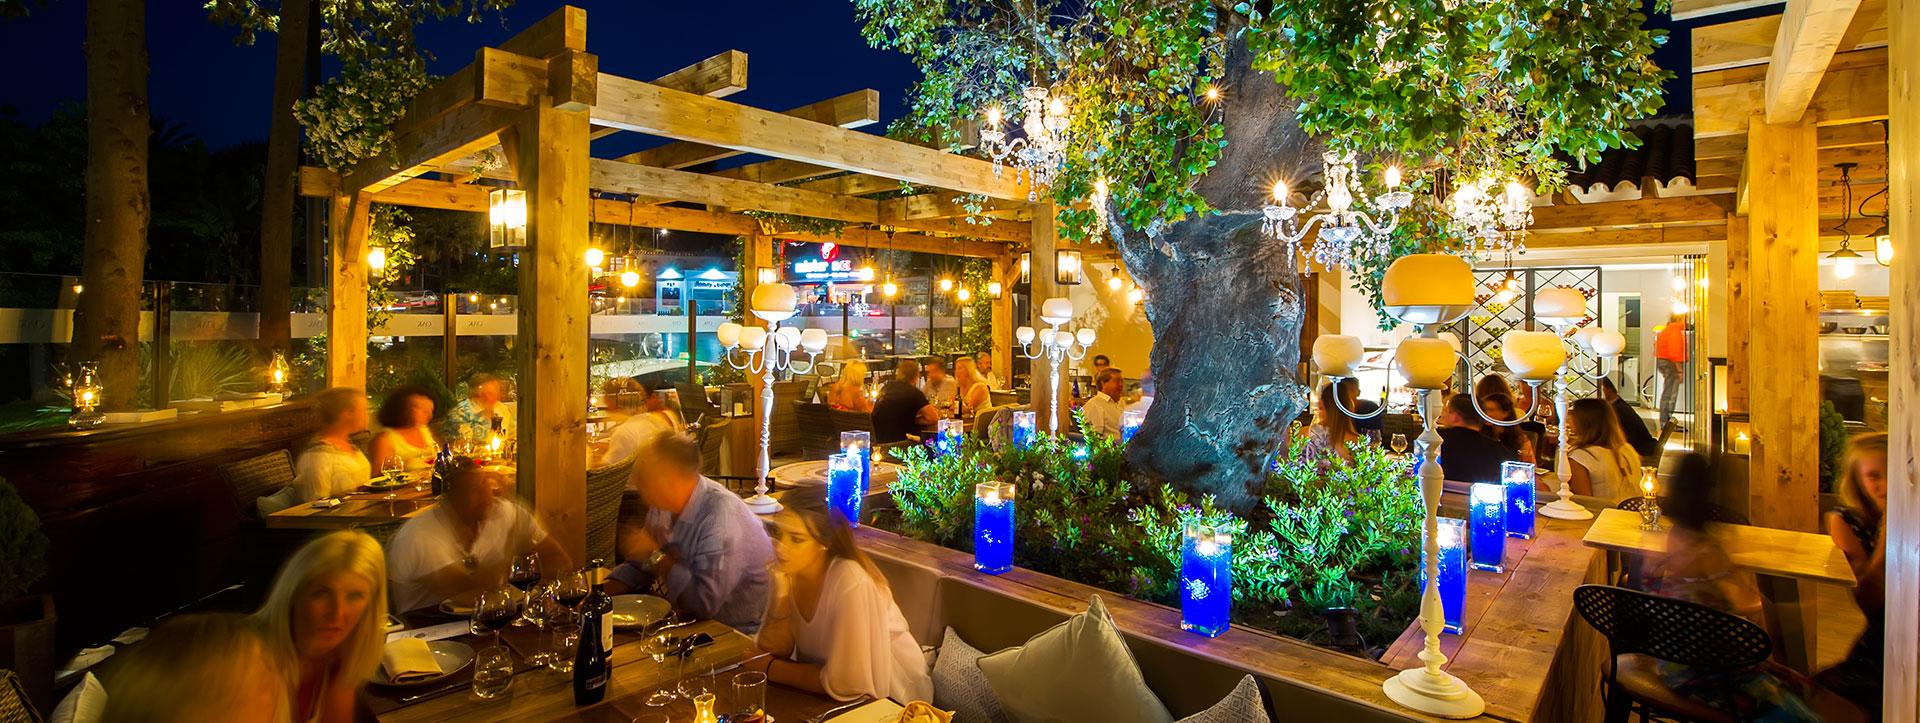 OAK Garden and Grill Meat, Steak and Fish Restaurant Puerto Banus